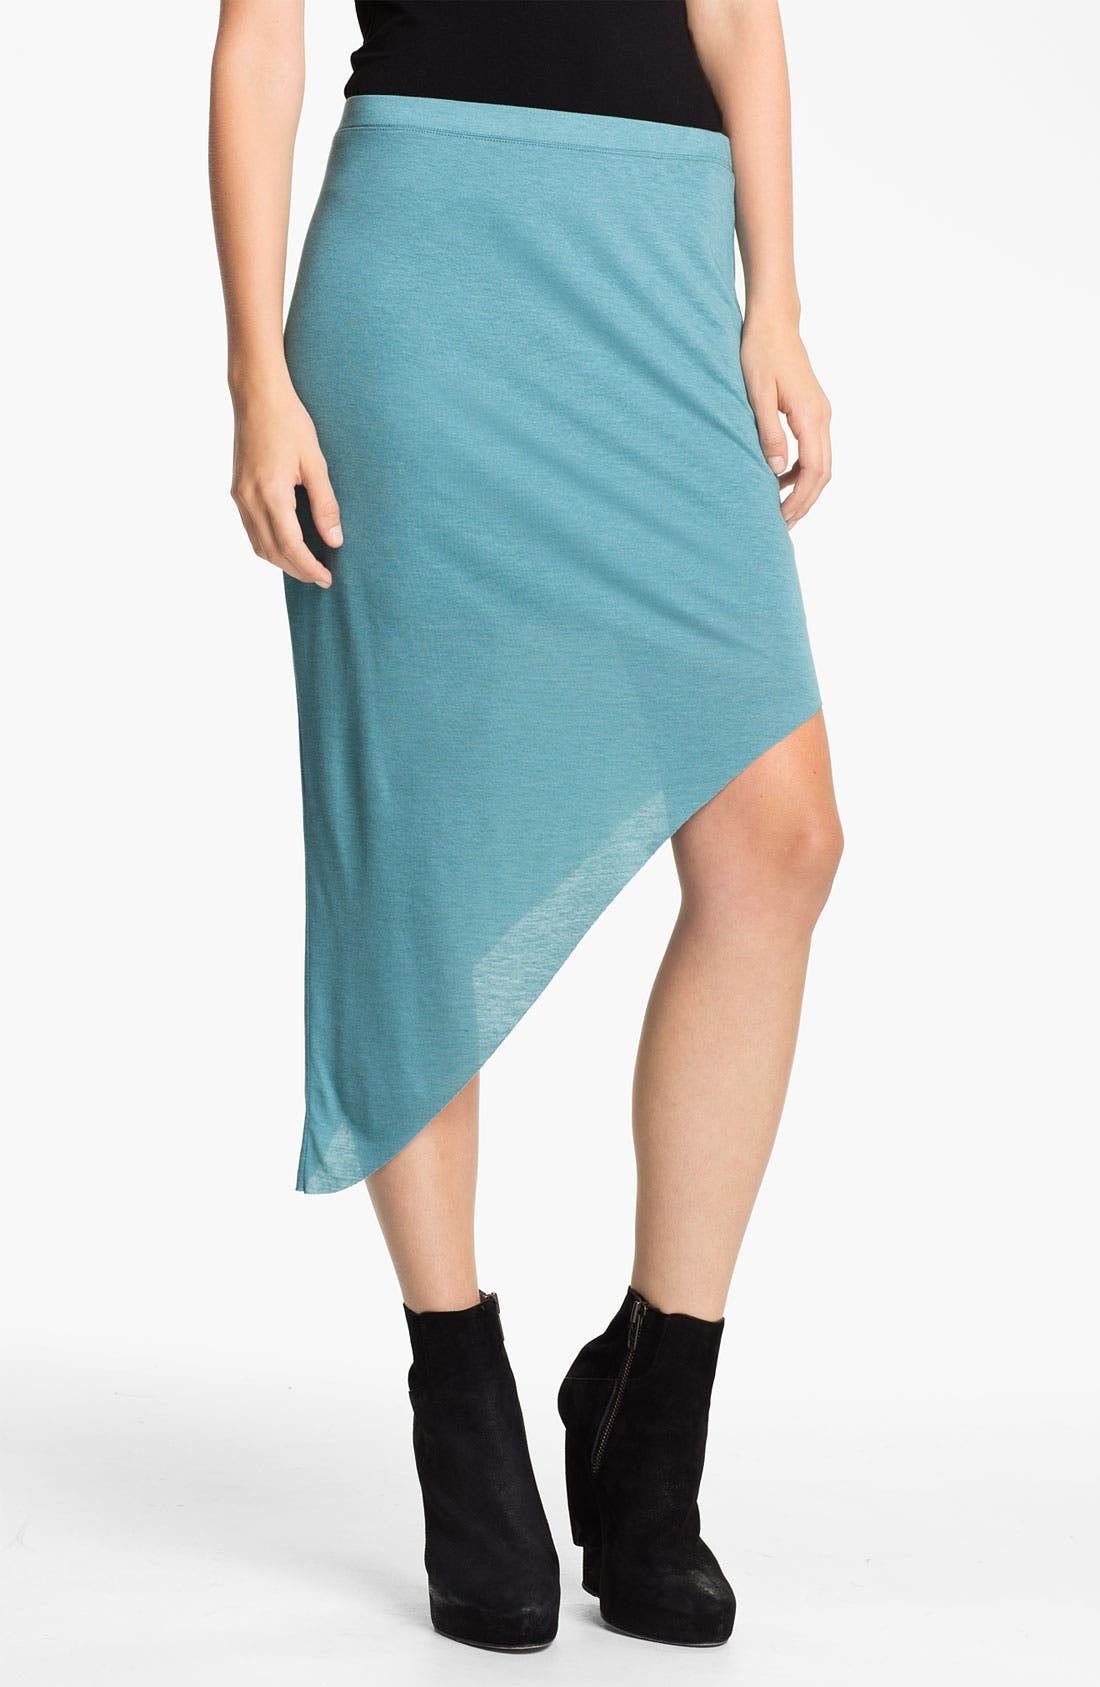 Alternate Image 1 Selected - HELMUT Helmut Lang 'Kinetic' Angled Jersey Skirt